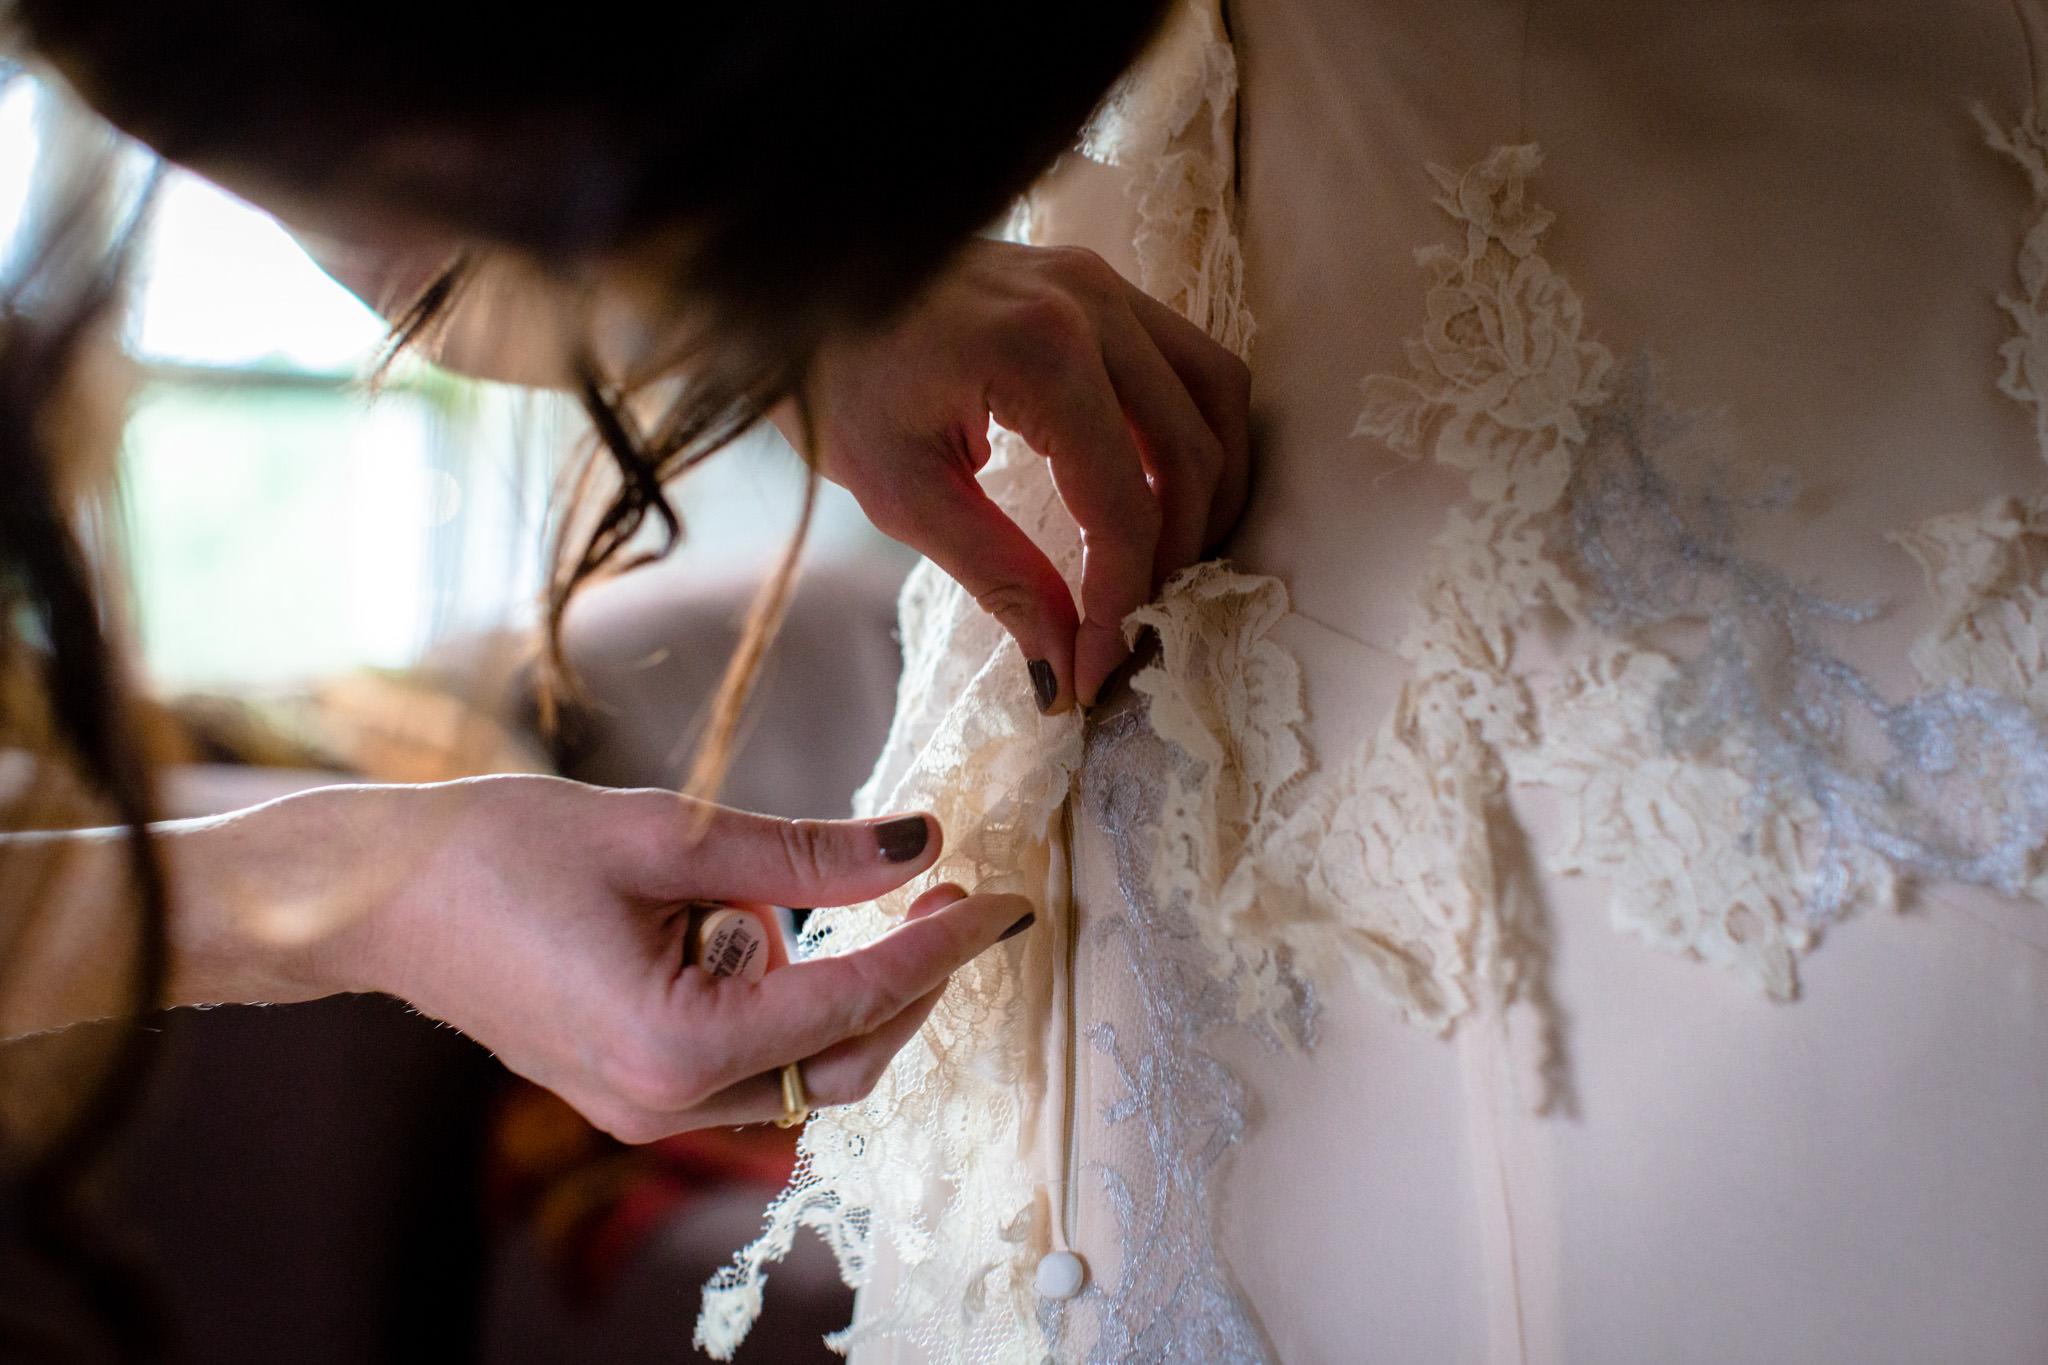 Clissold House wedding zipping up the dress